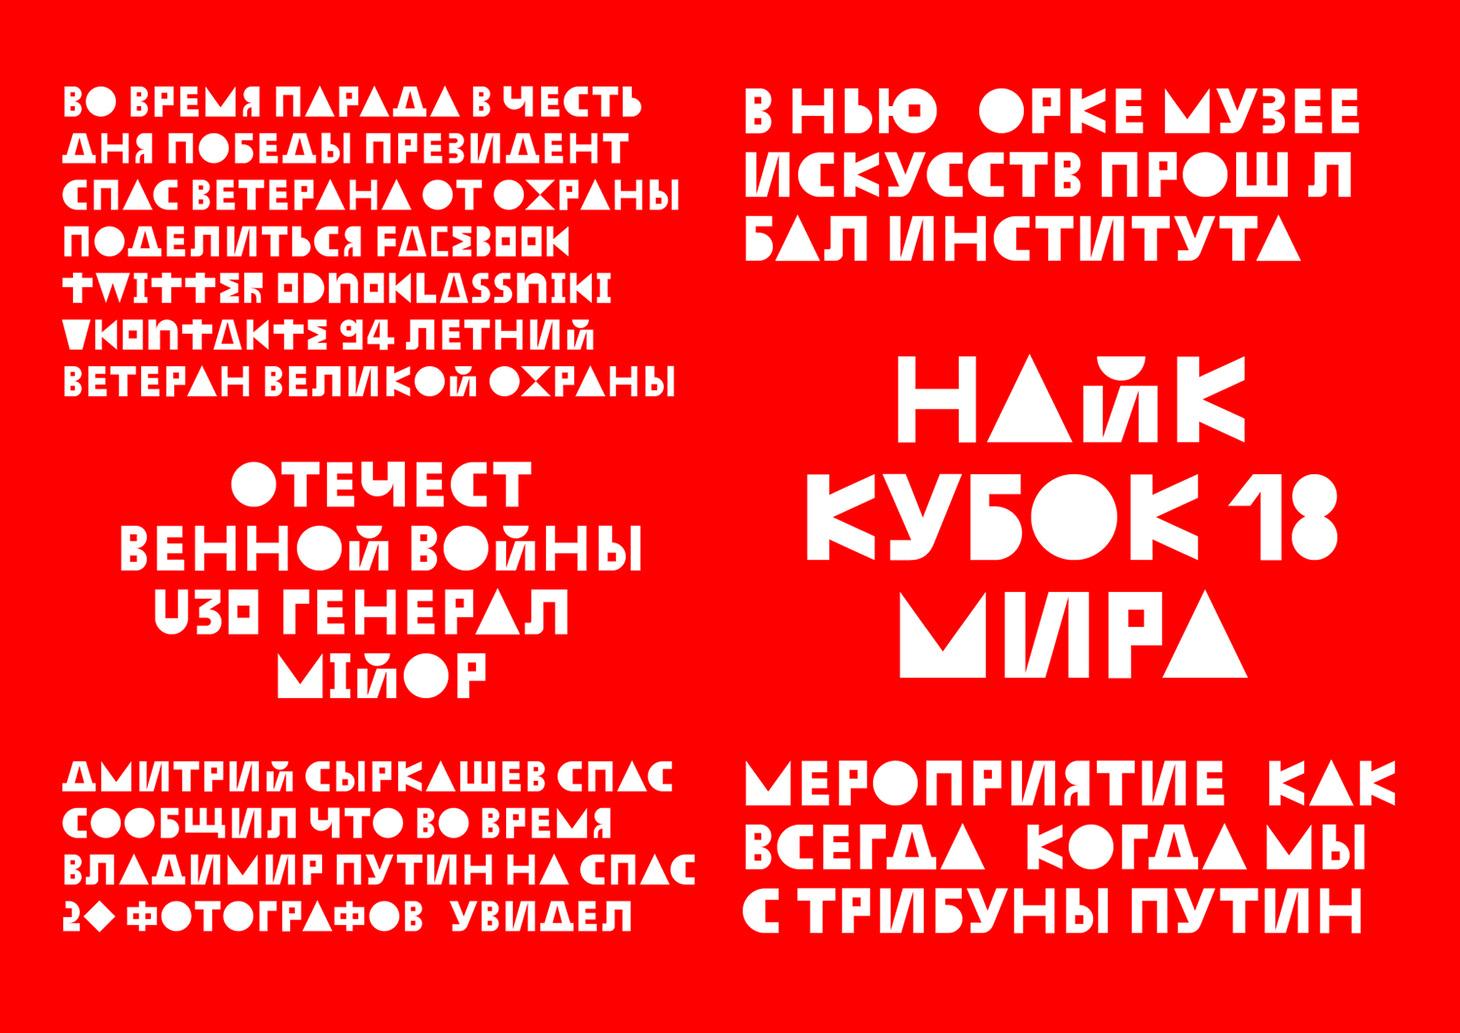 Dinamo_Nike_Gorky_Worldcup7